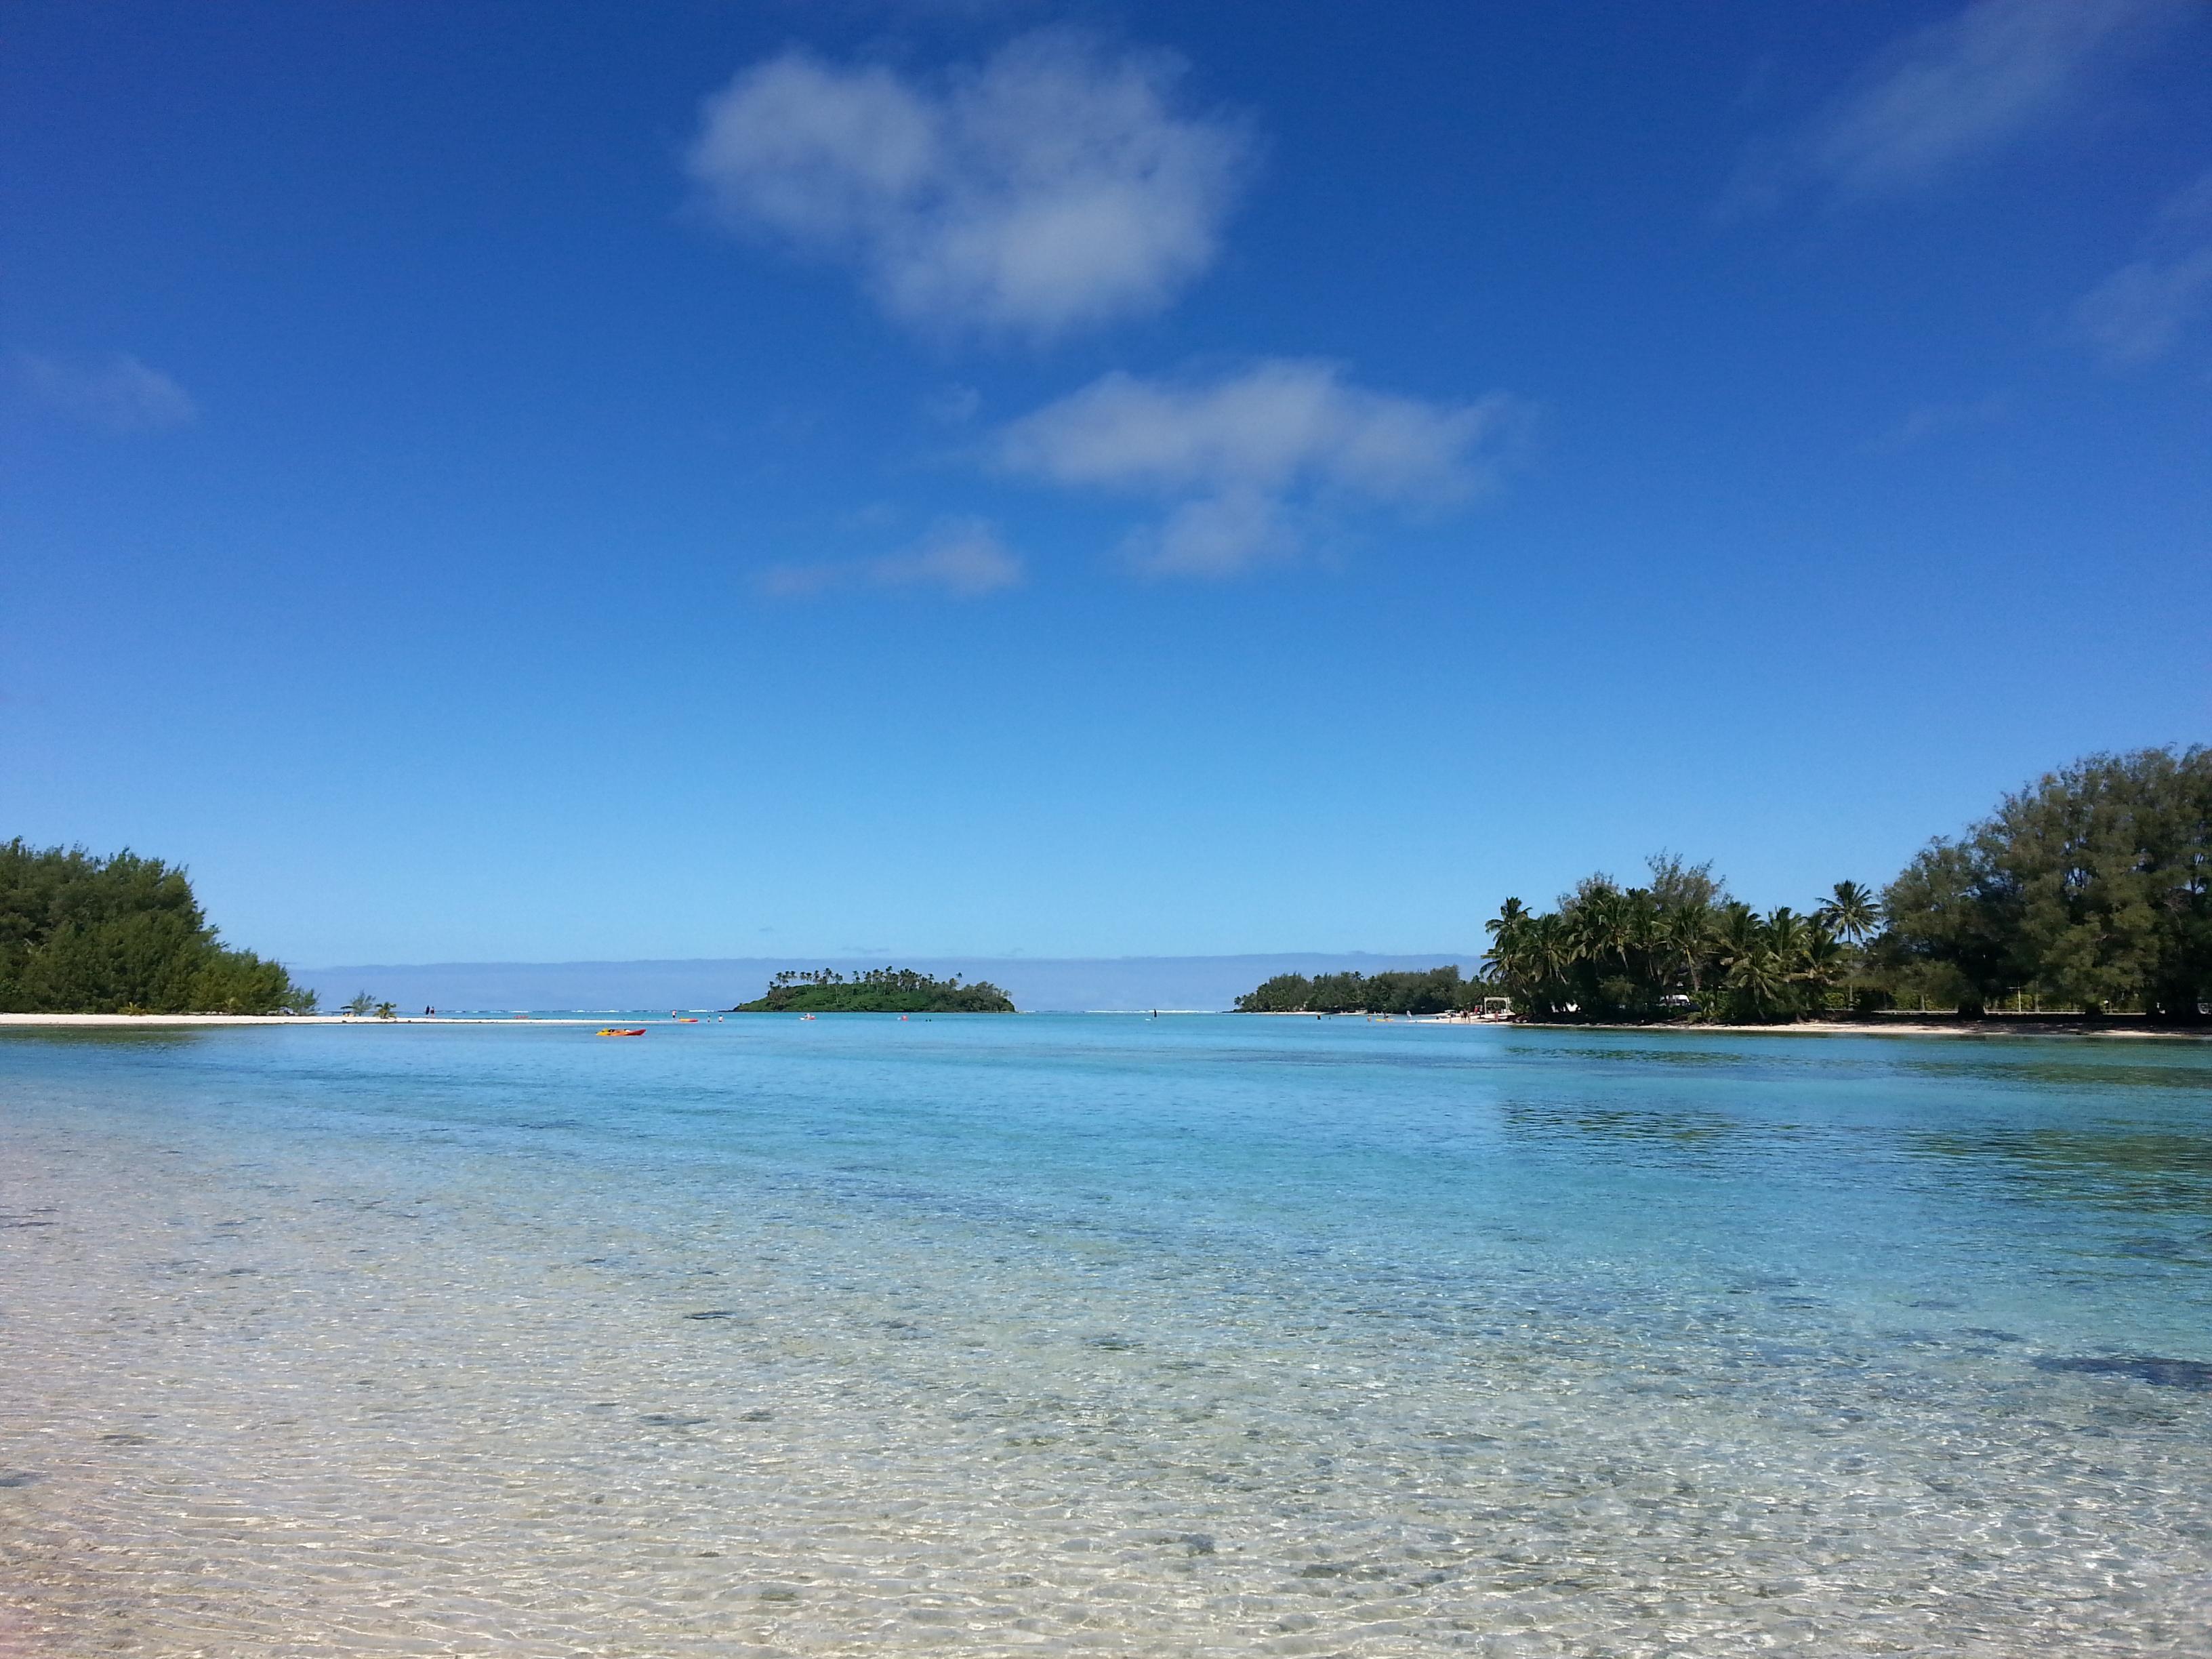 Four beautiful islets